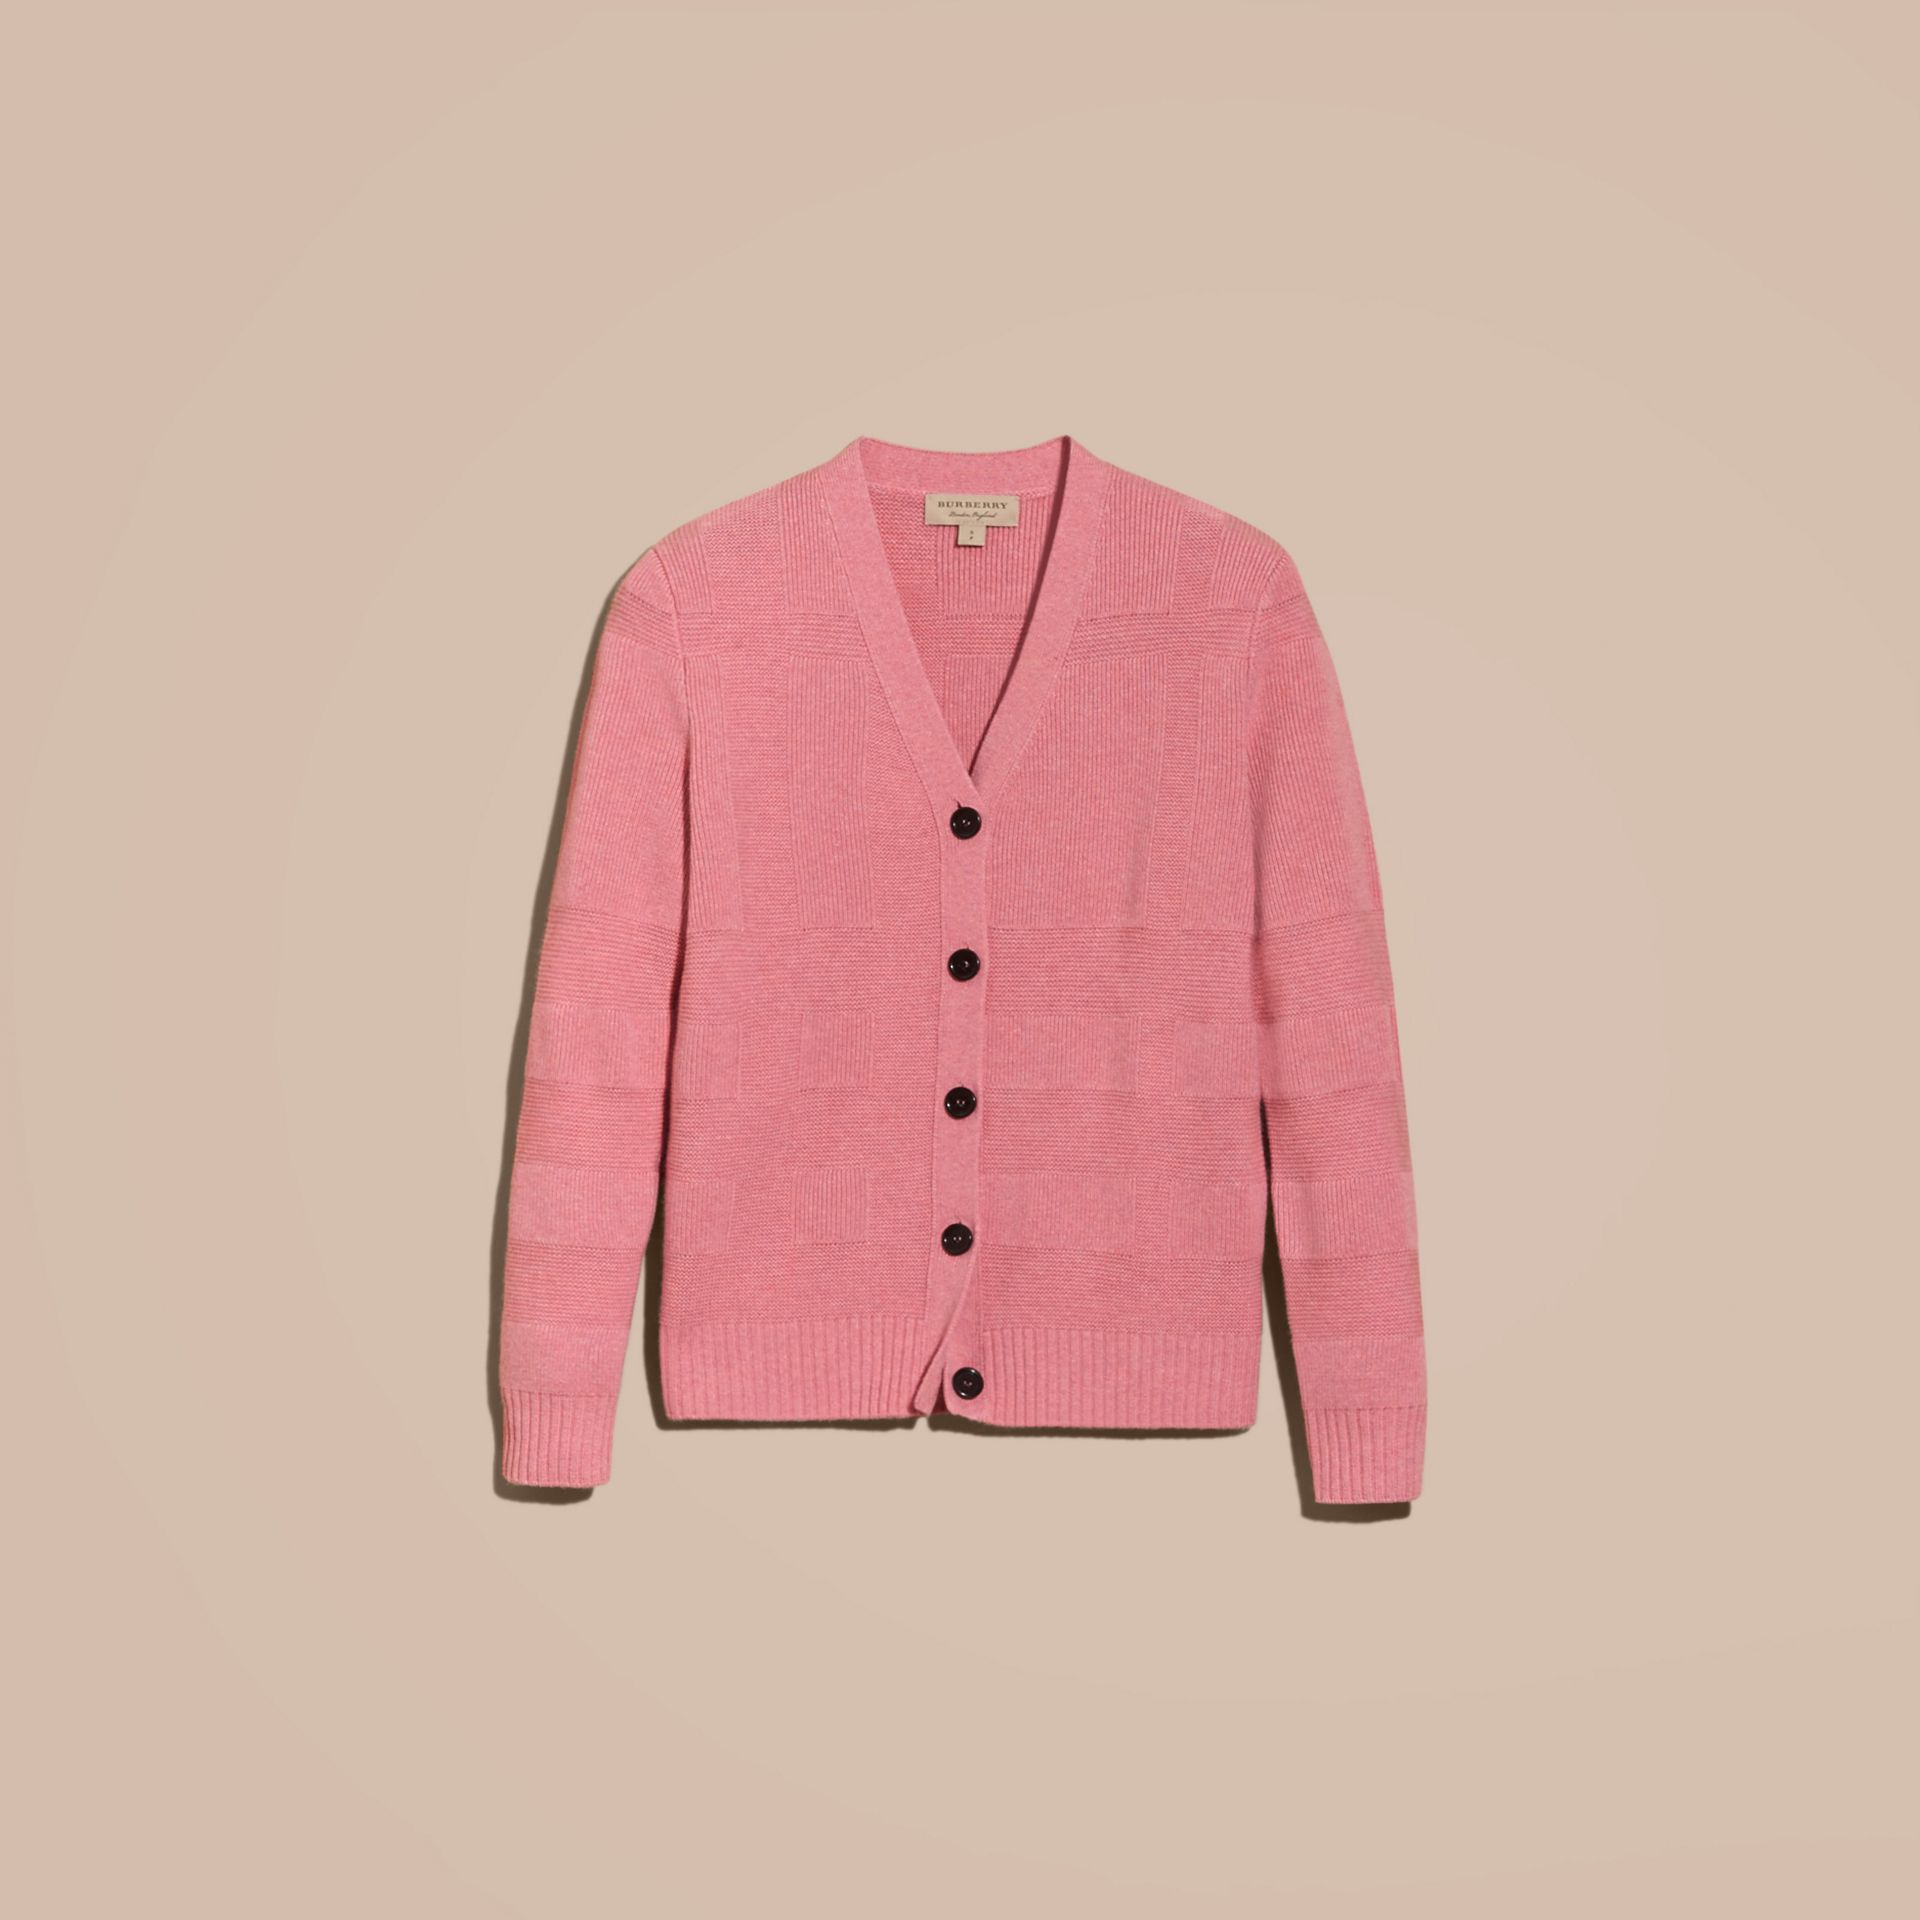 Hydrangea pink melange Check-knit Wool Cashmere Cardigan Hydrangea Pink Melange - gallery image 4